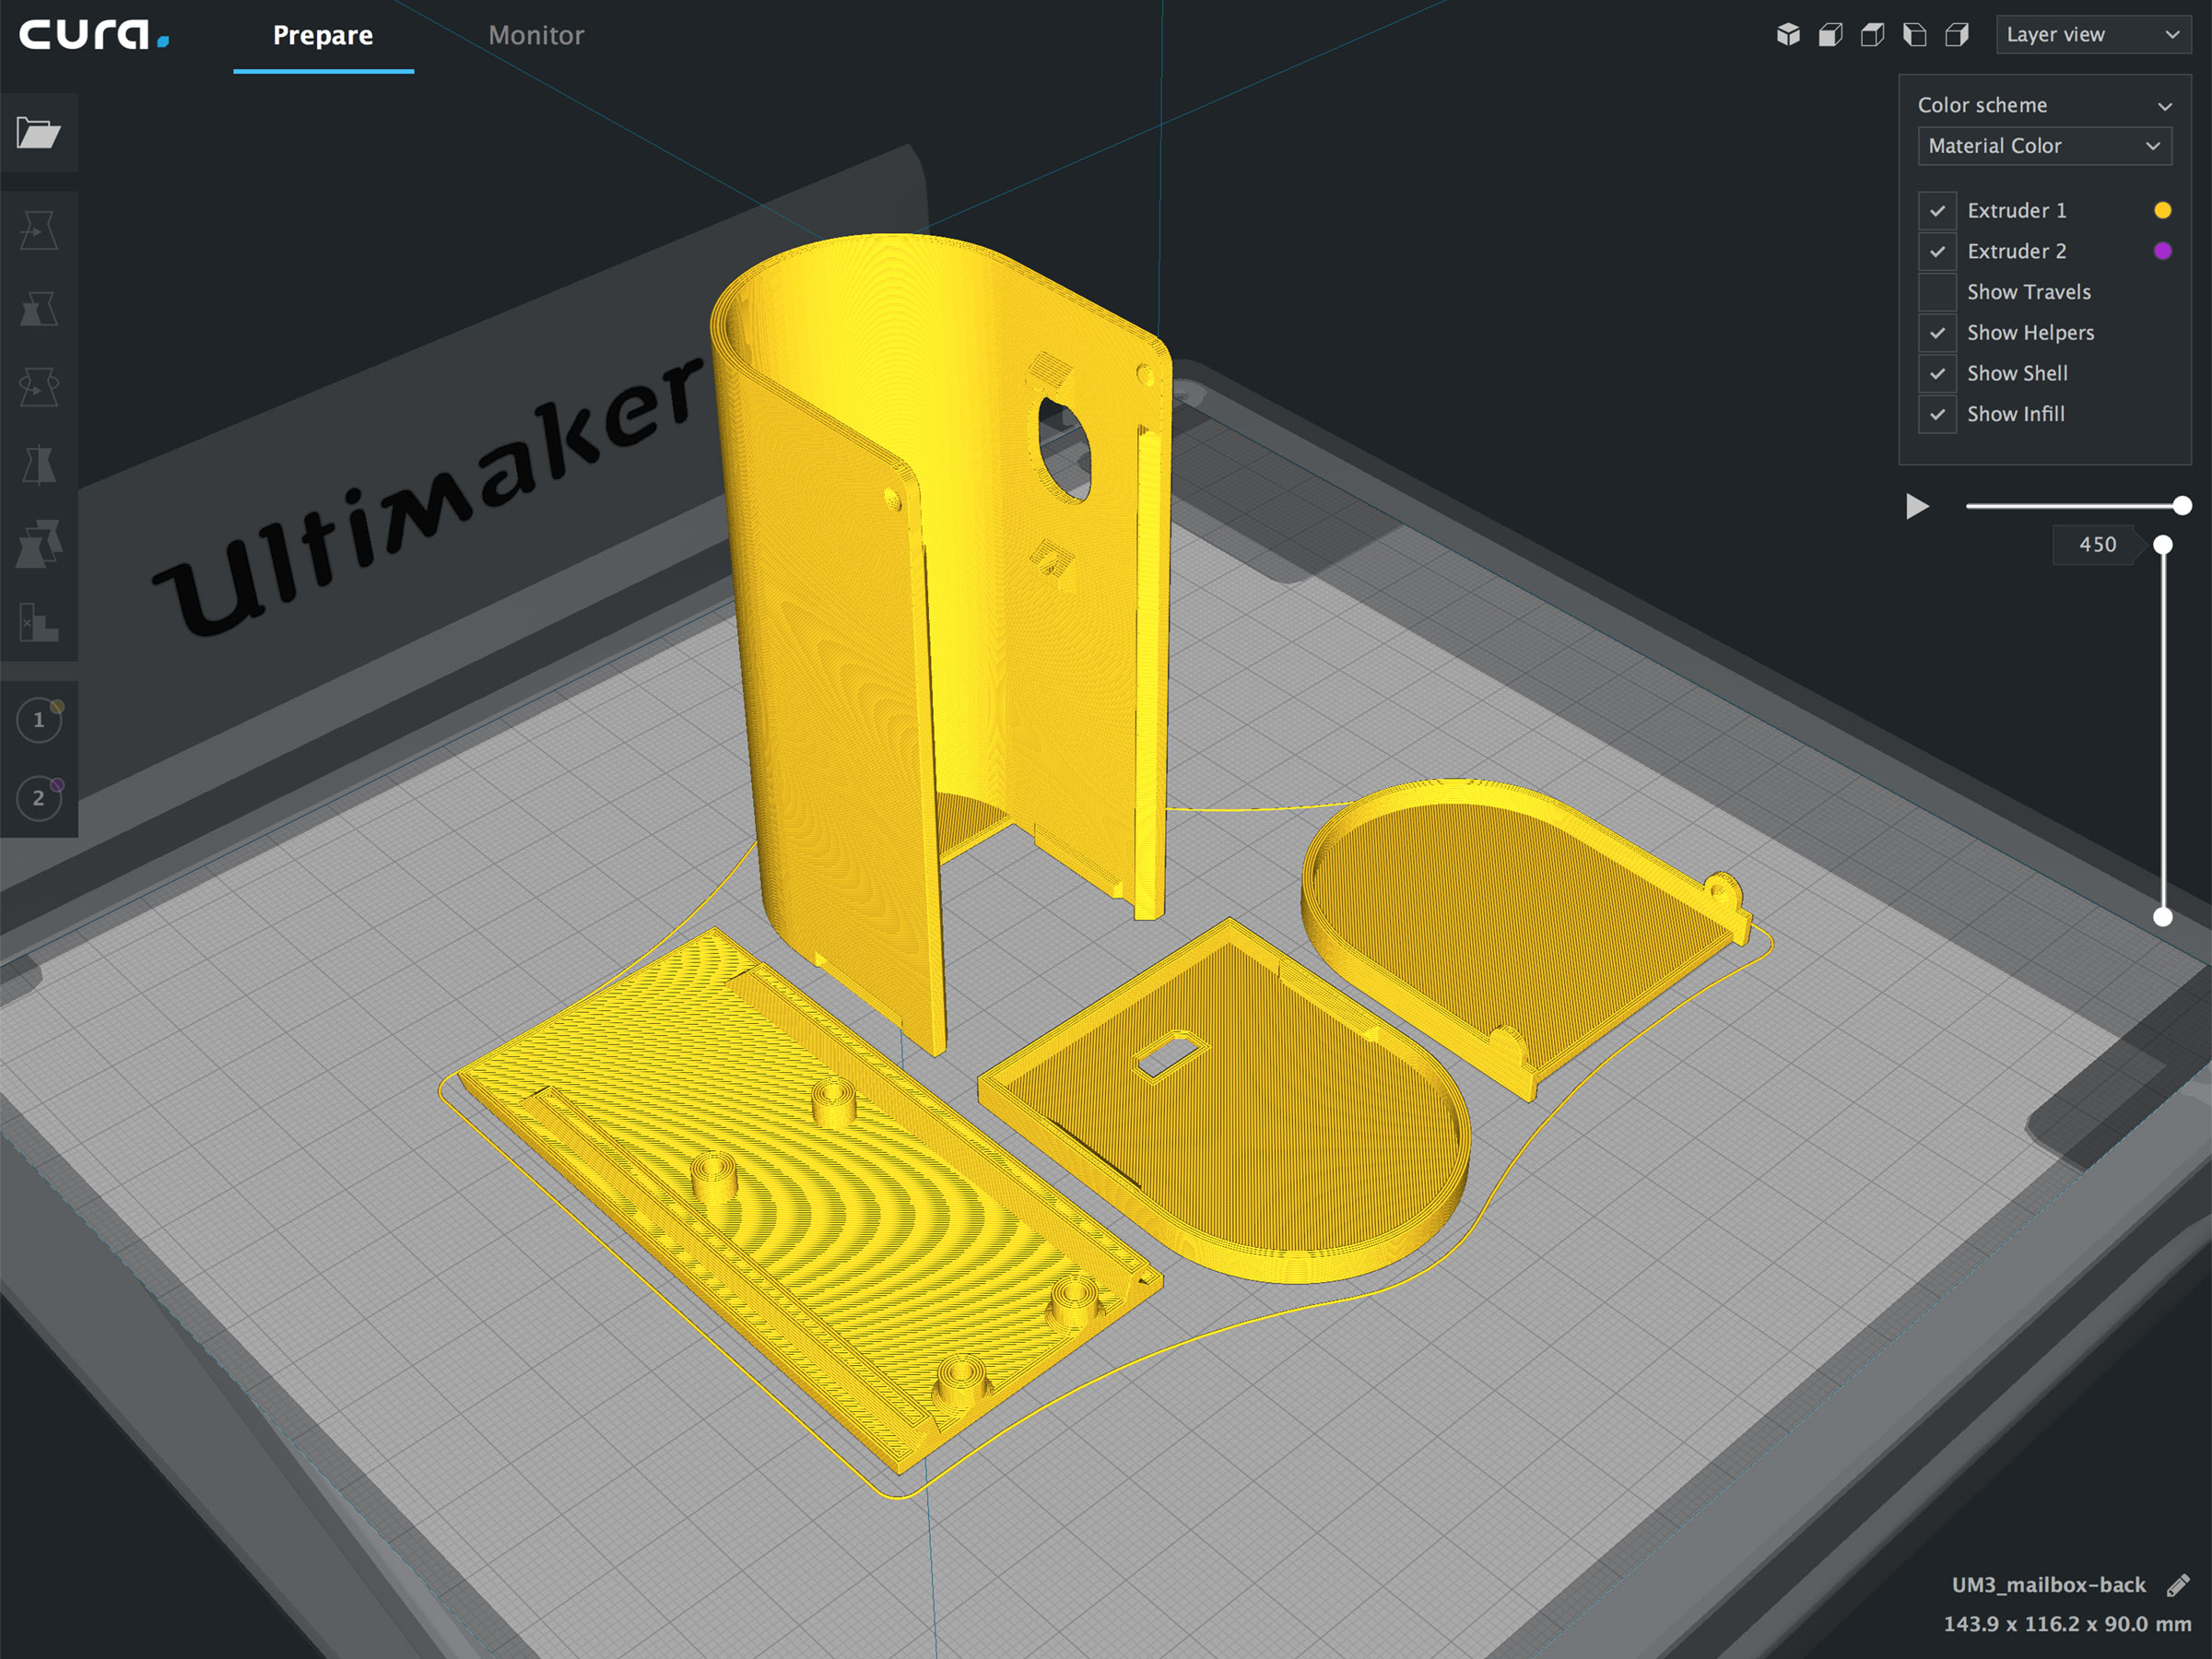 3d_printing_cura-slice-preview.jpg